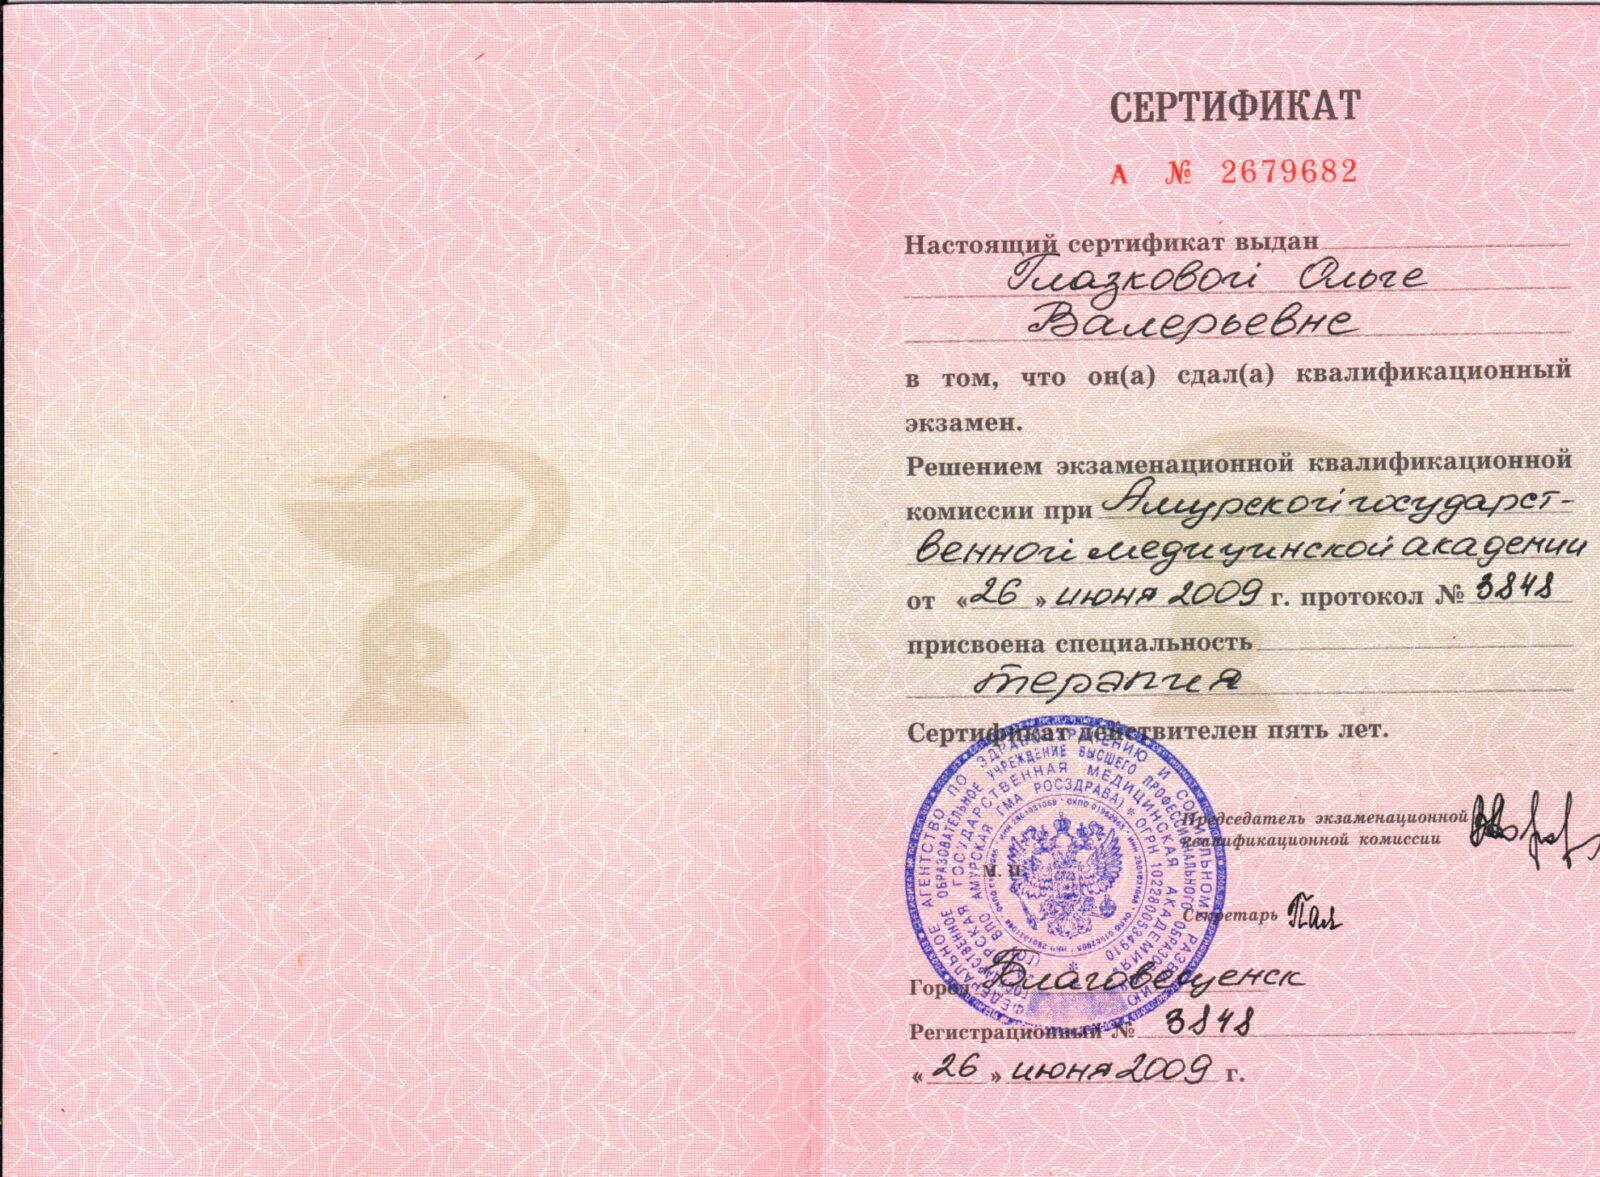 2009.06.26 Сертификат